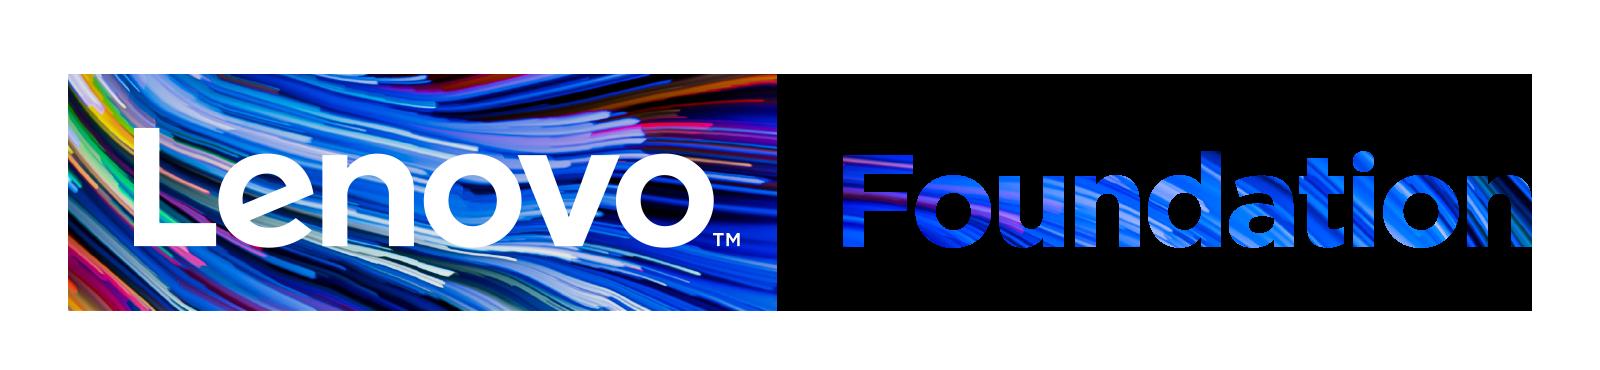 Lenovo_Foundation_HOR_Infill (1).png